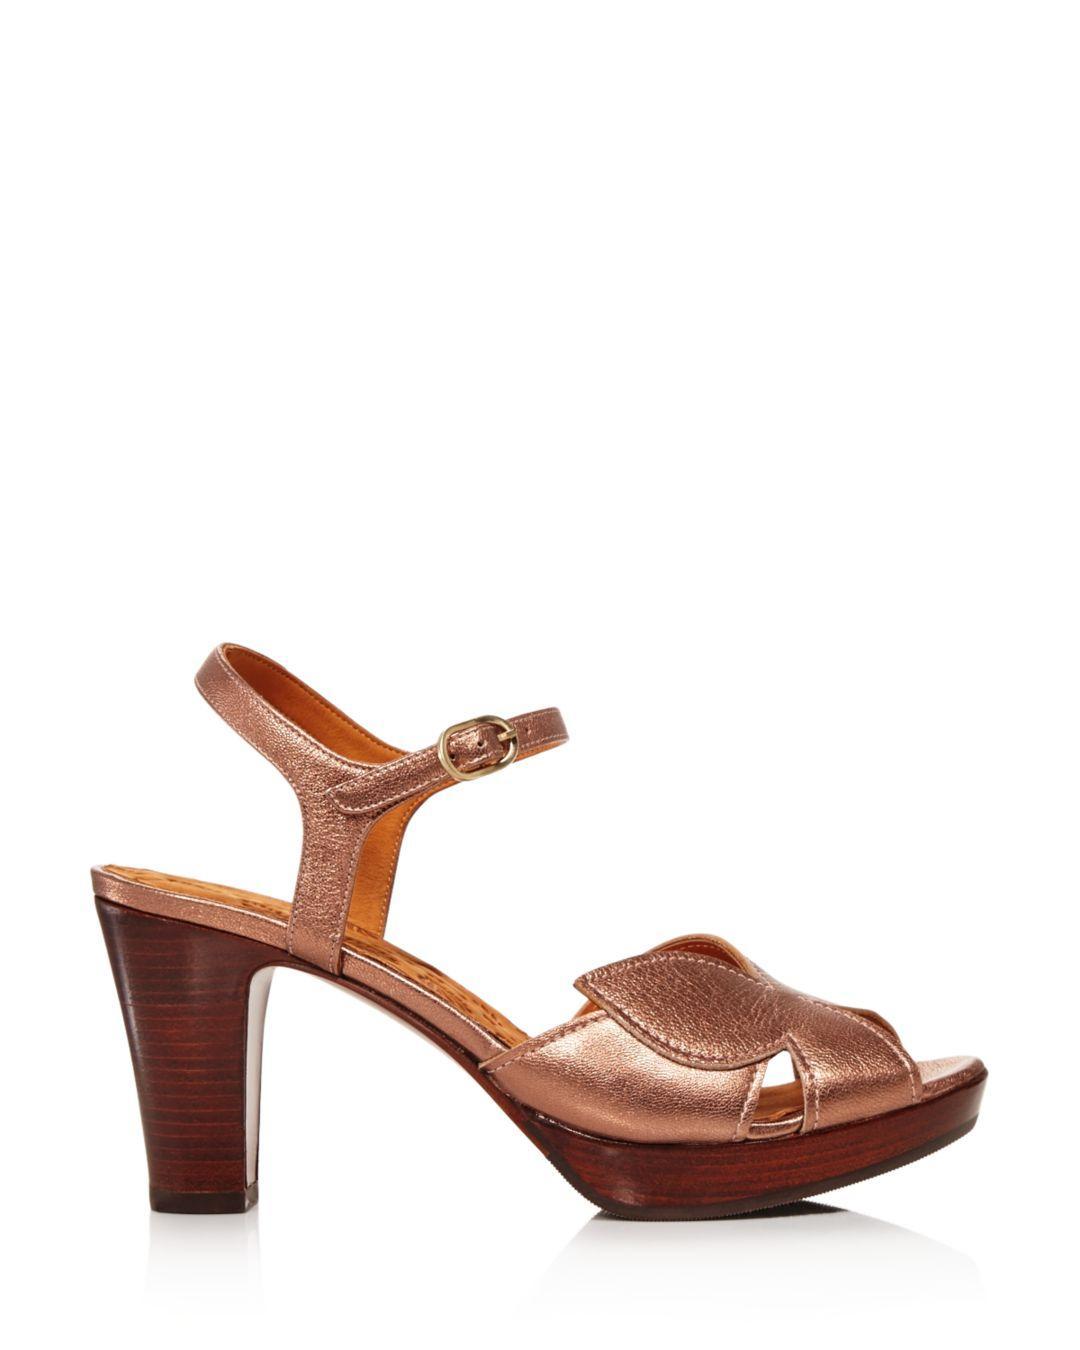 d6e35e96984 Lyst - Chie Mihara Women s Posh Chunky Heel Metallic Sandals in Brown